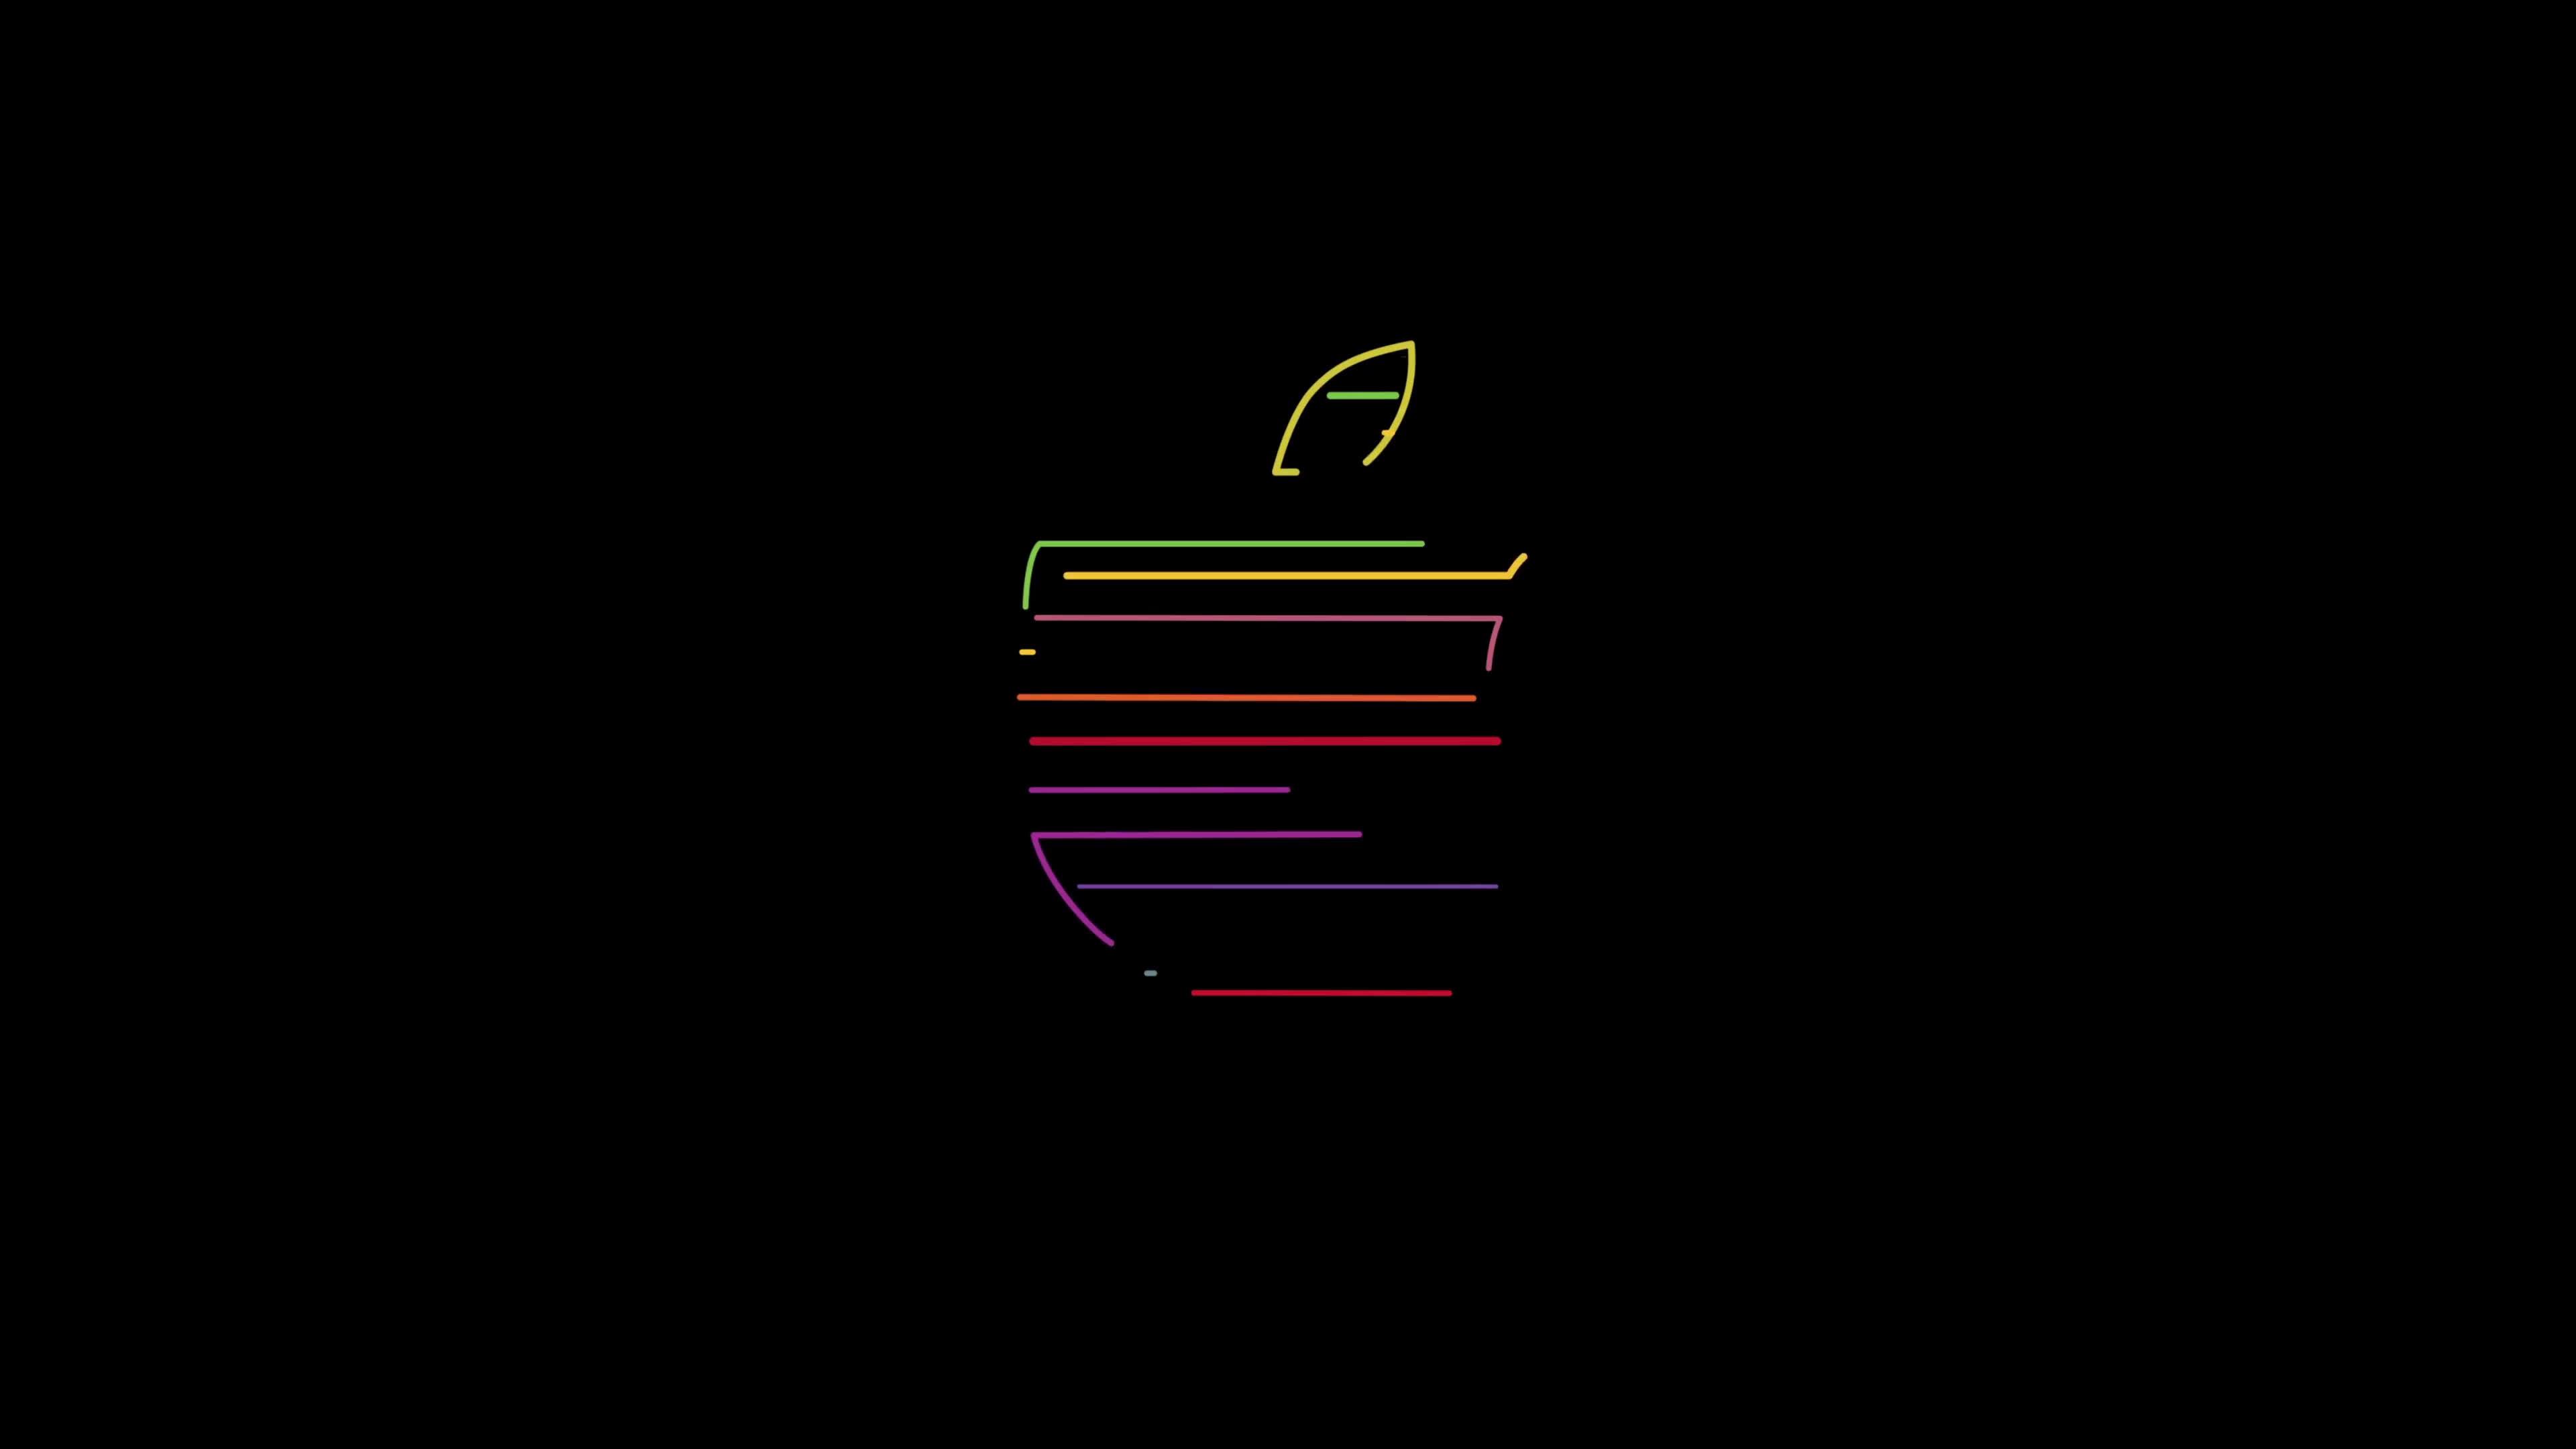 Apple Logo 4k Live Wallpaper Desktophut Com